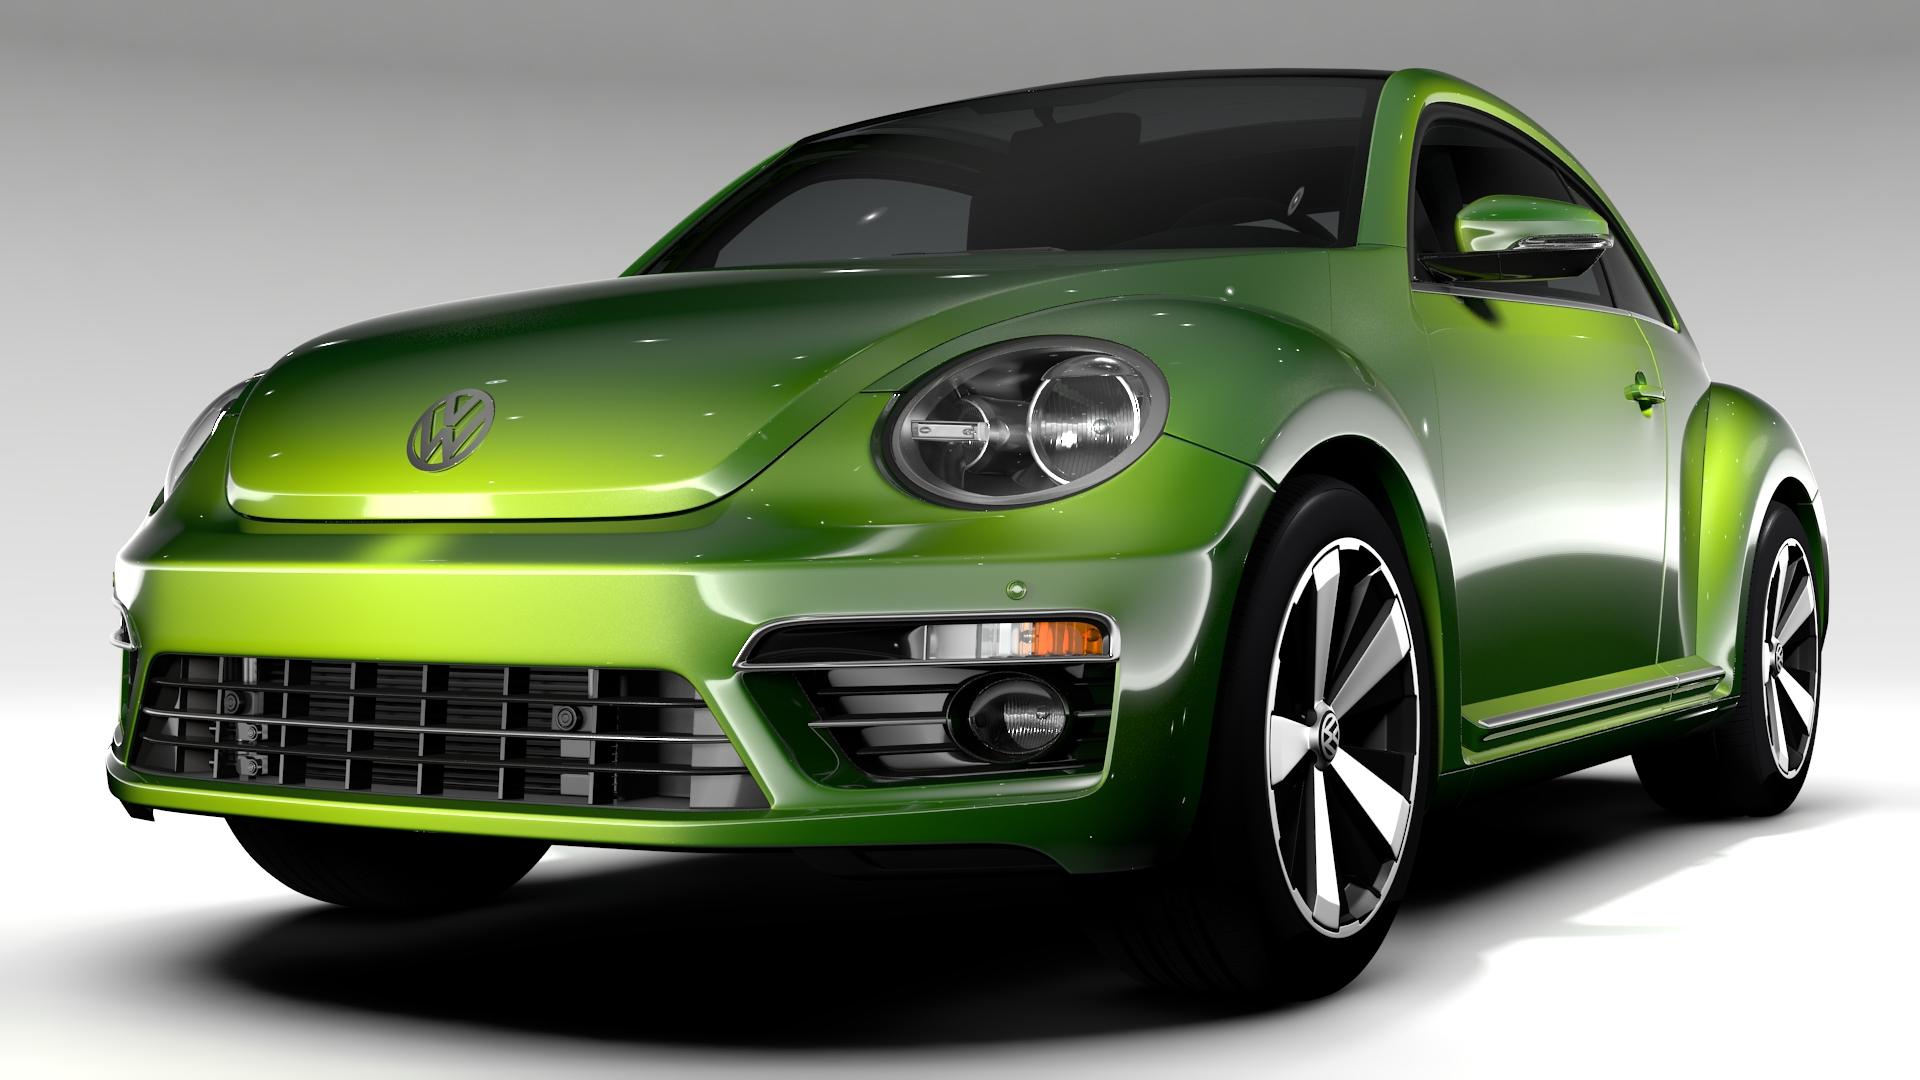 vw beetle 2017 3d model 3ds max fbx c4d lwo ma mb hrc xsi obj 221565